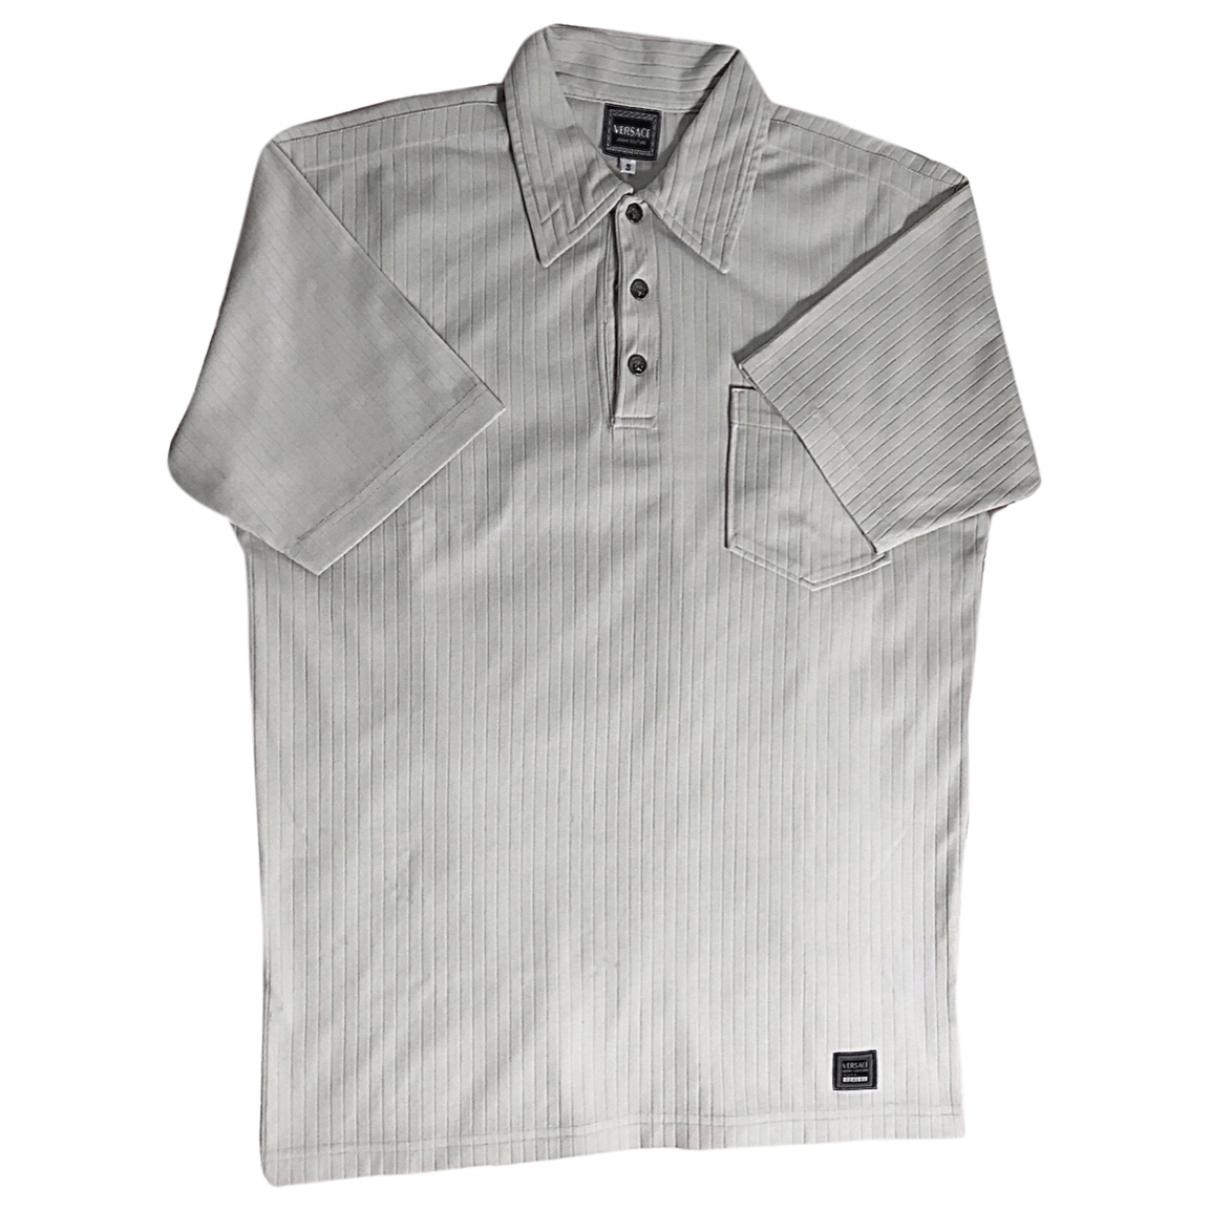 Versace N White Shirts for Men S International